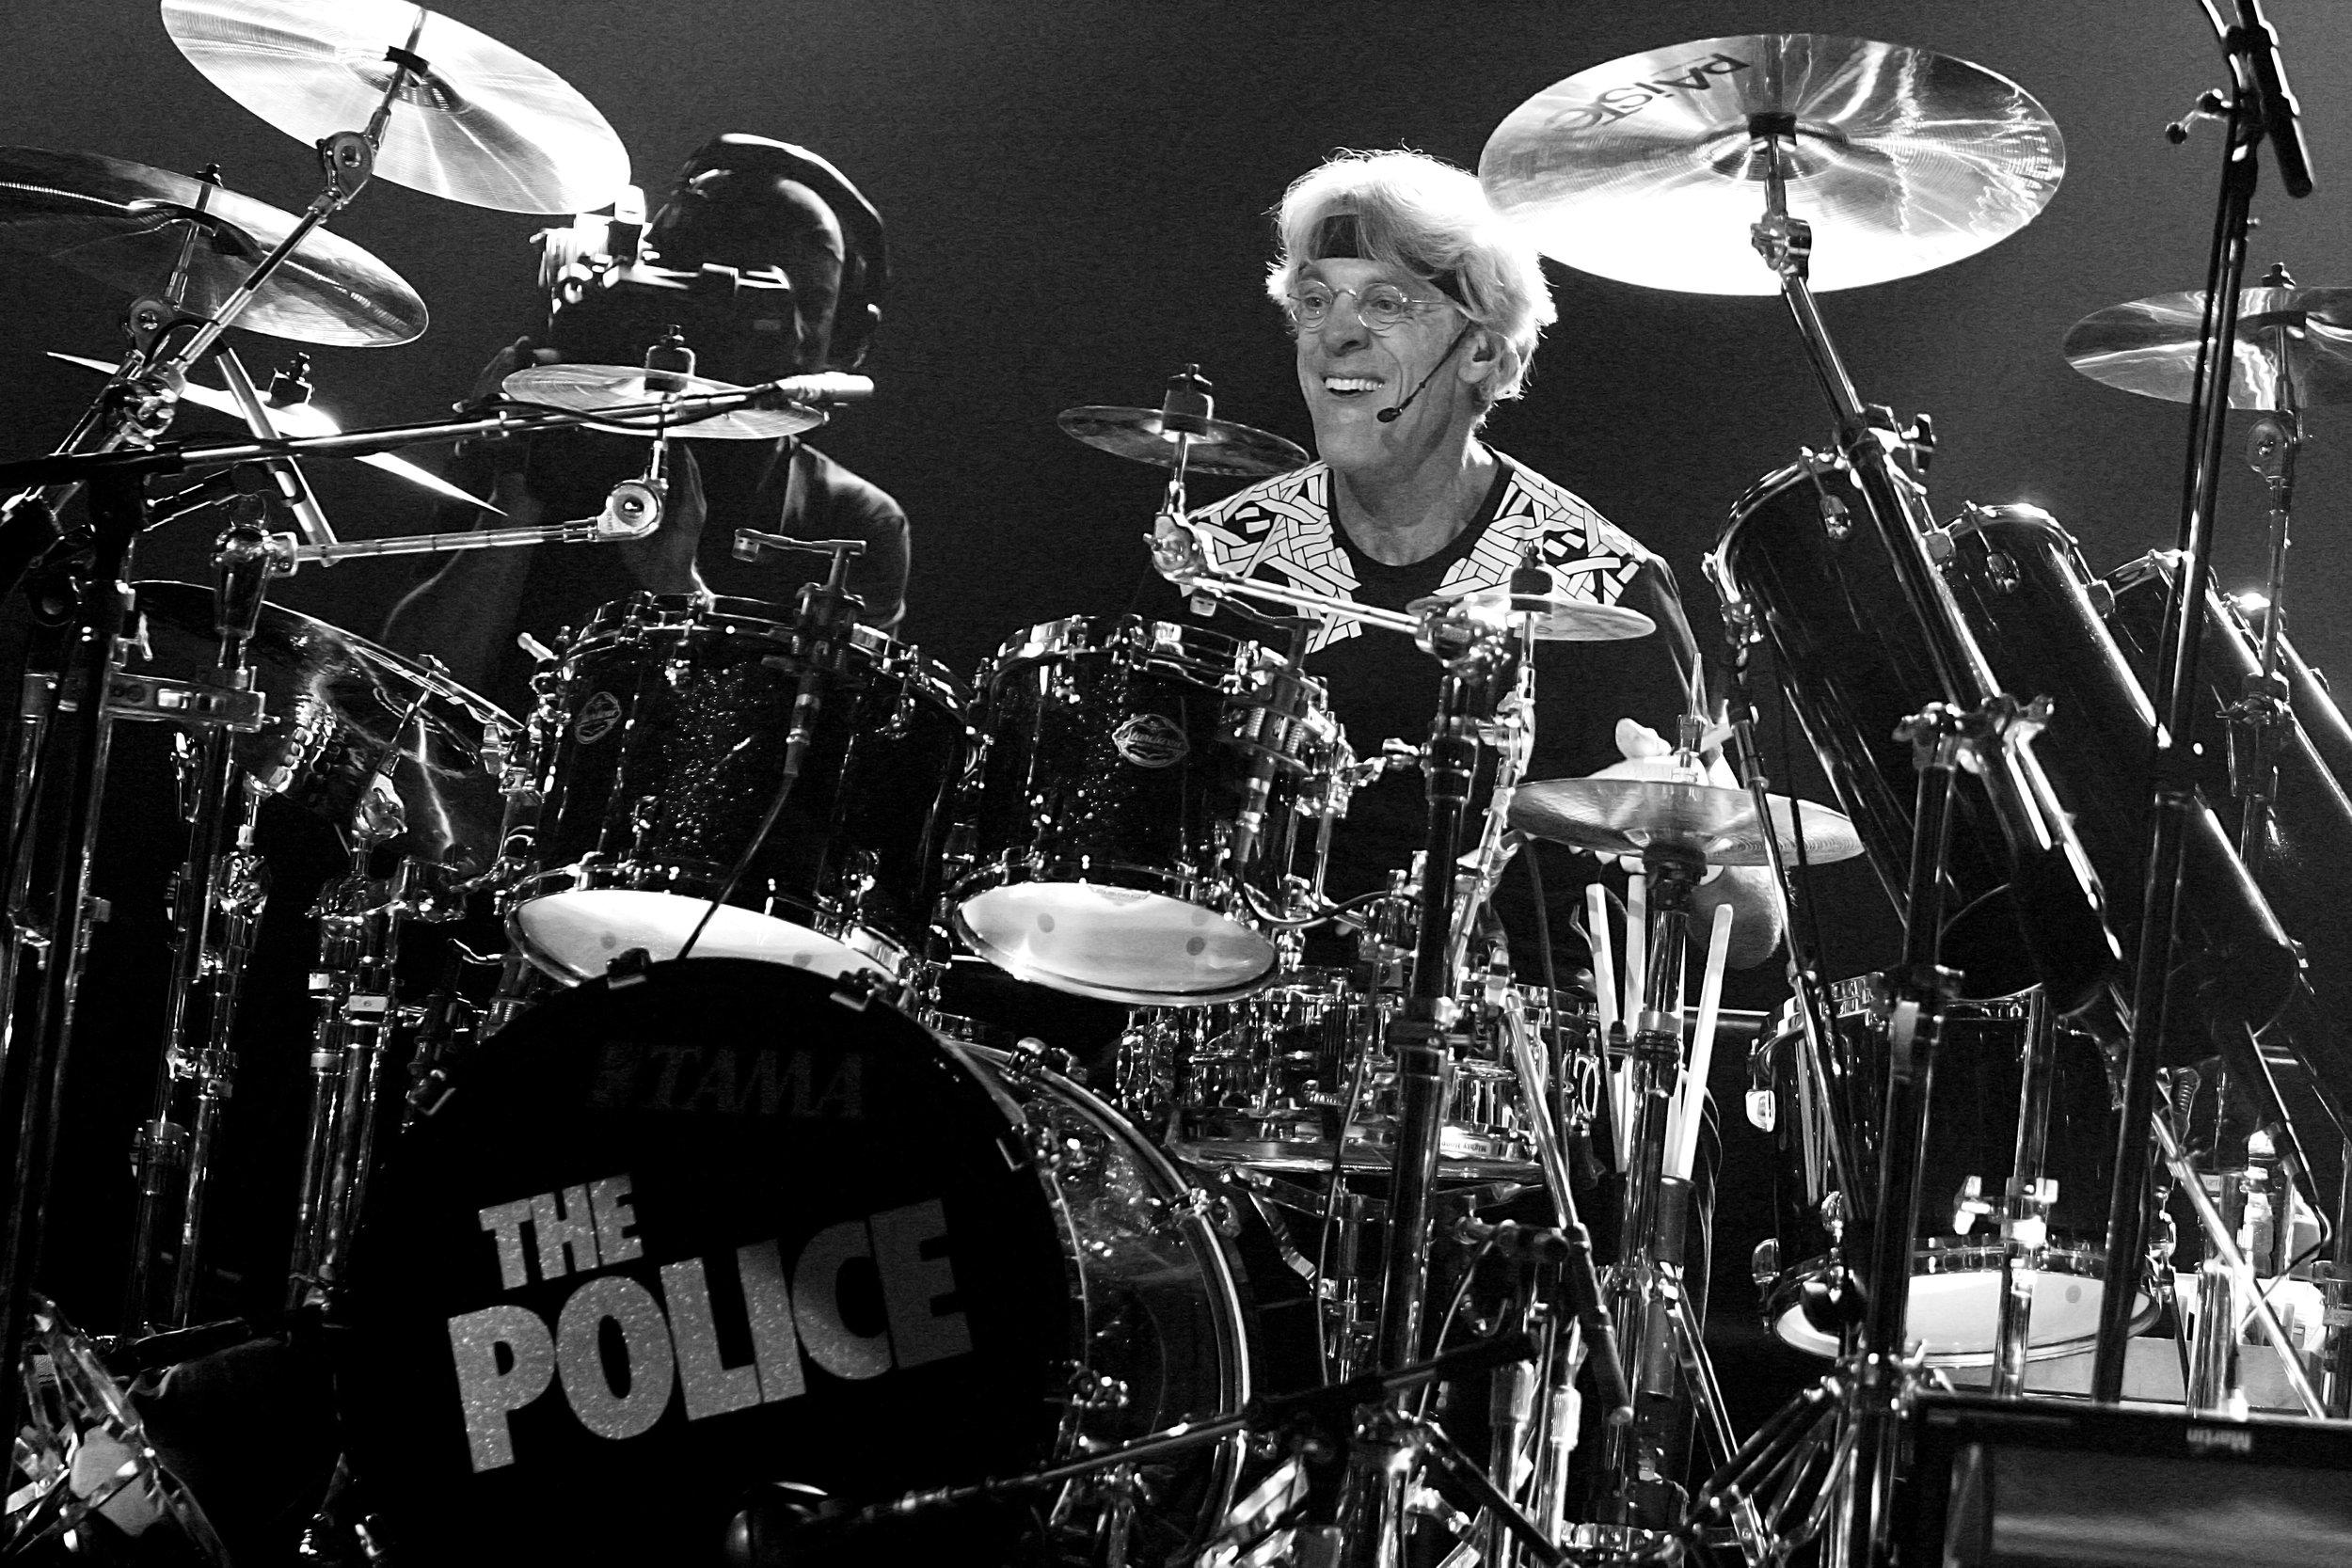 The Police | MGM Grand Garden Arena | Las Vegas, NV | 5/23/2008